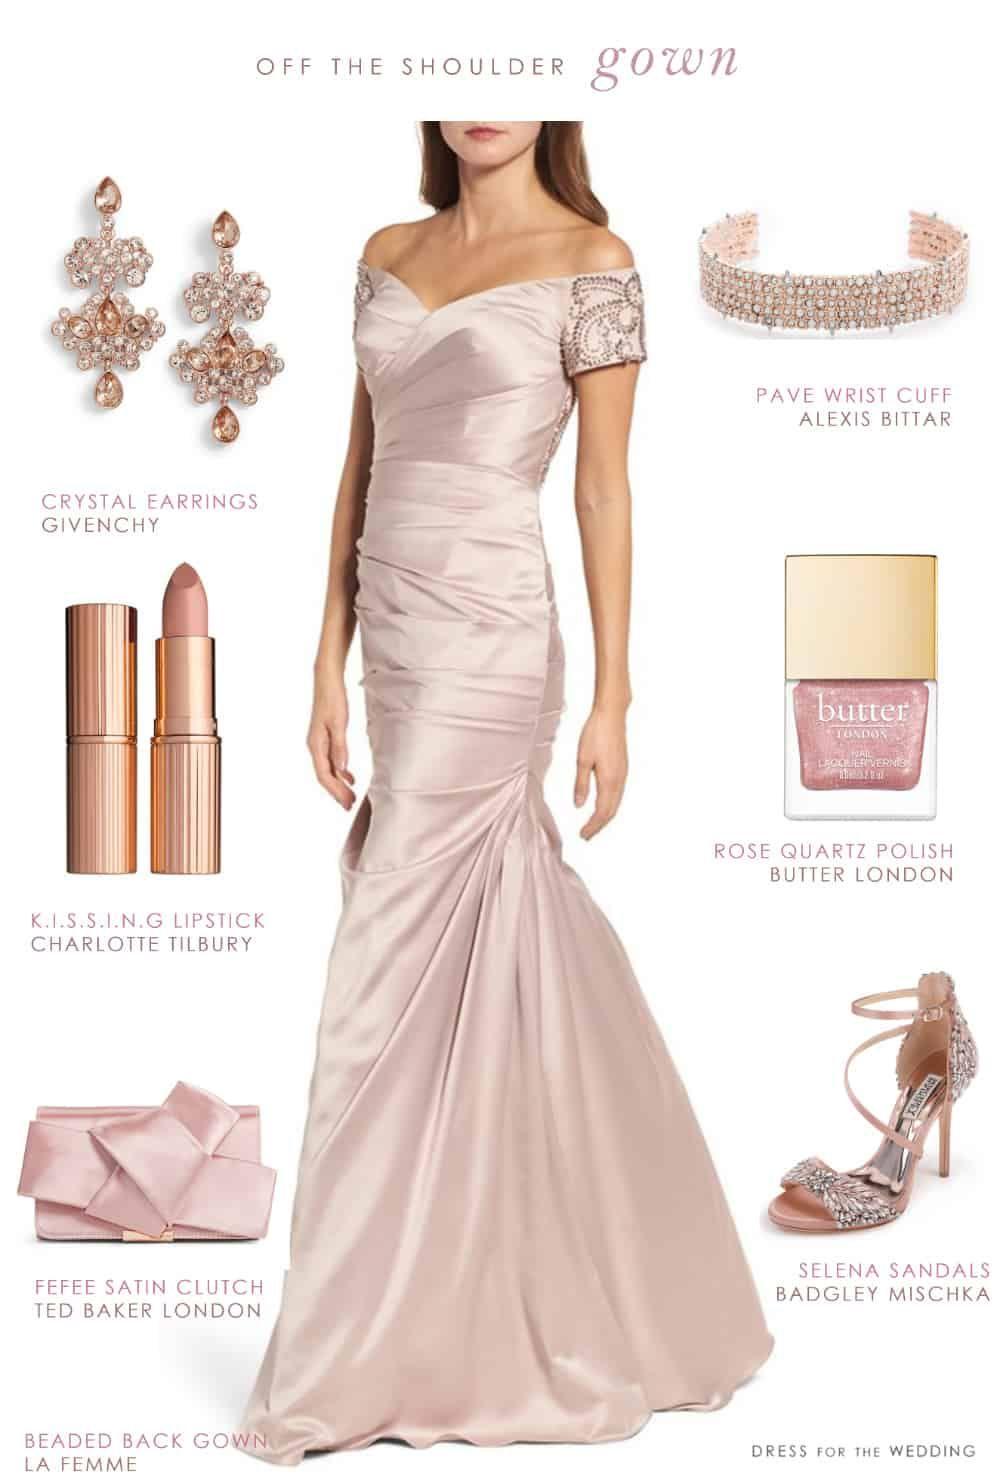 Offtheshoulder gown for a motherofthe bride gowns shoulder